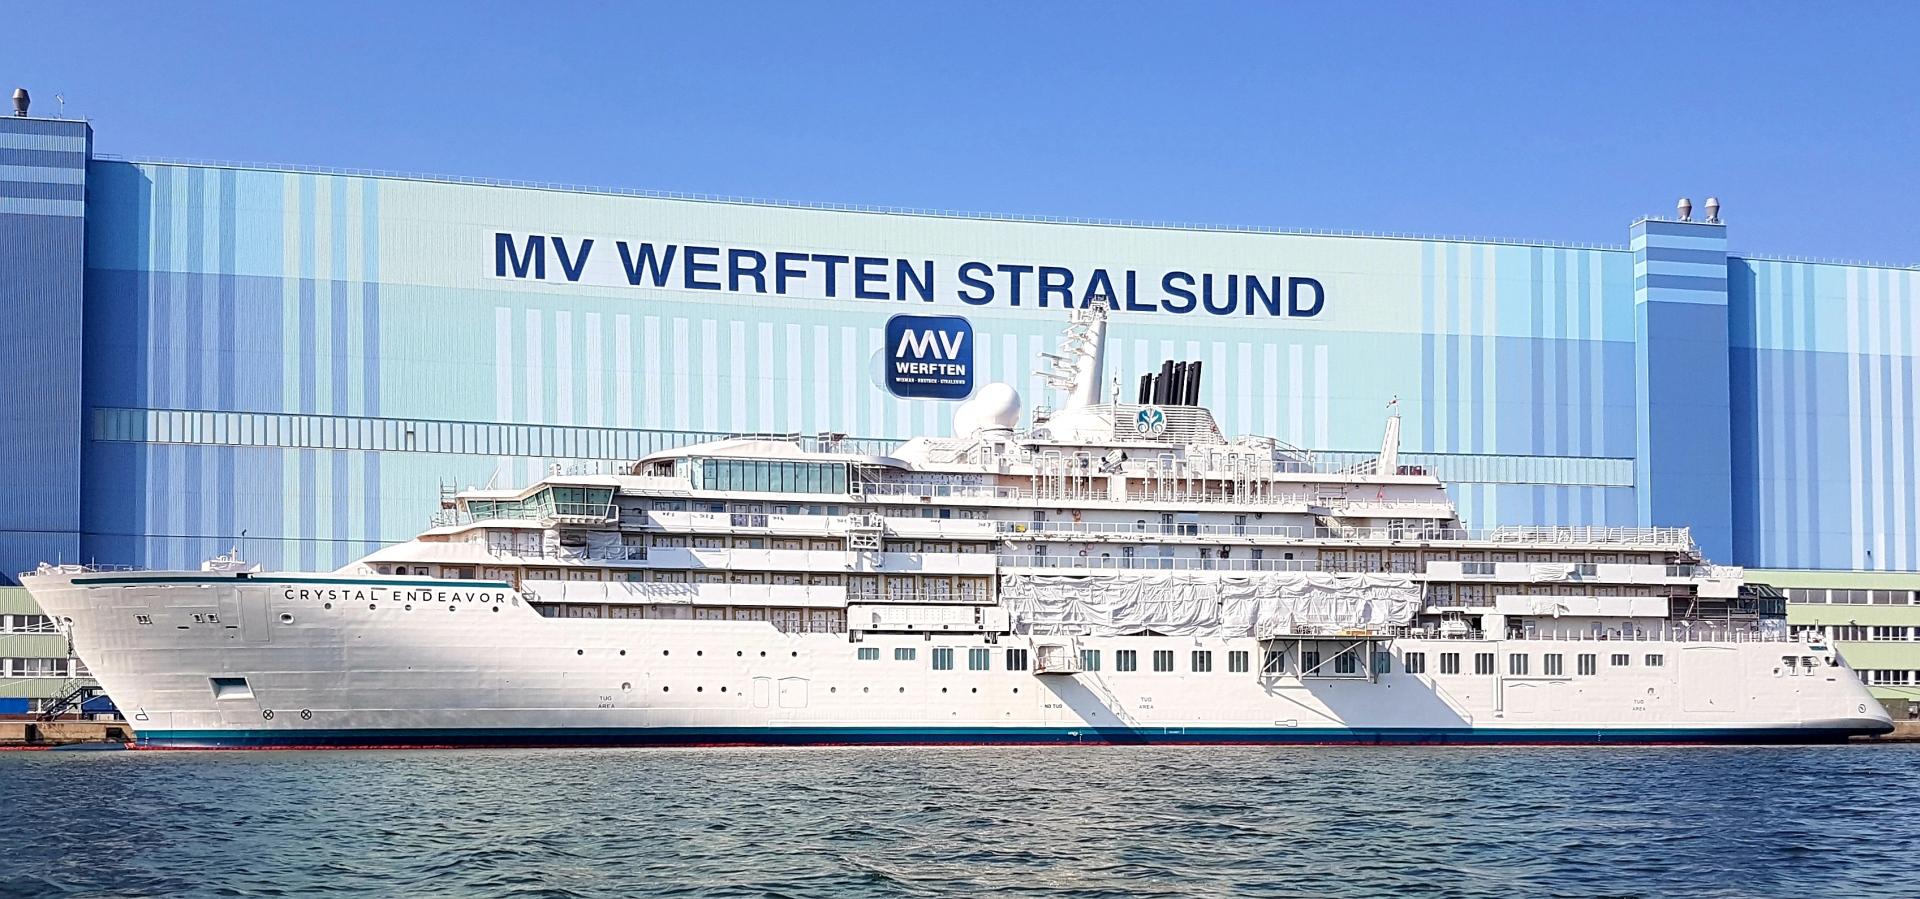 Corona In Stralsund